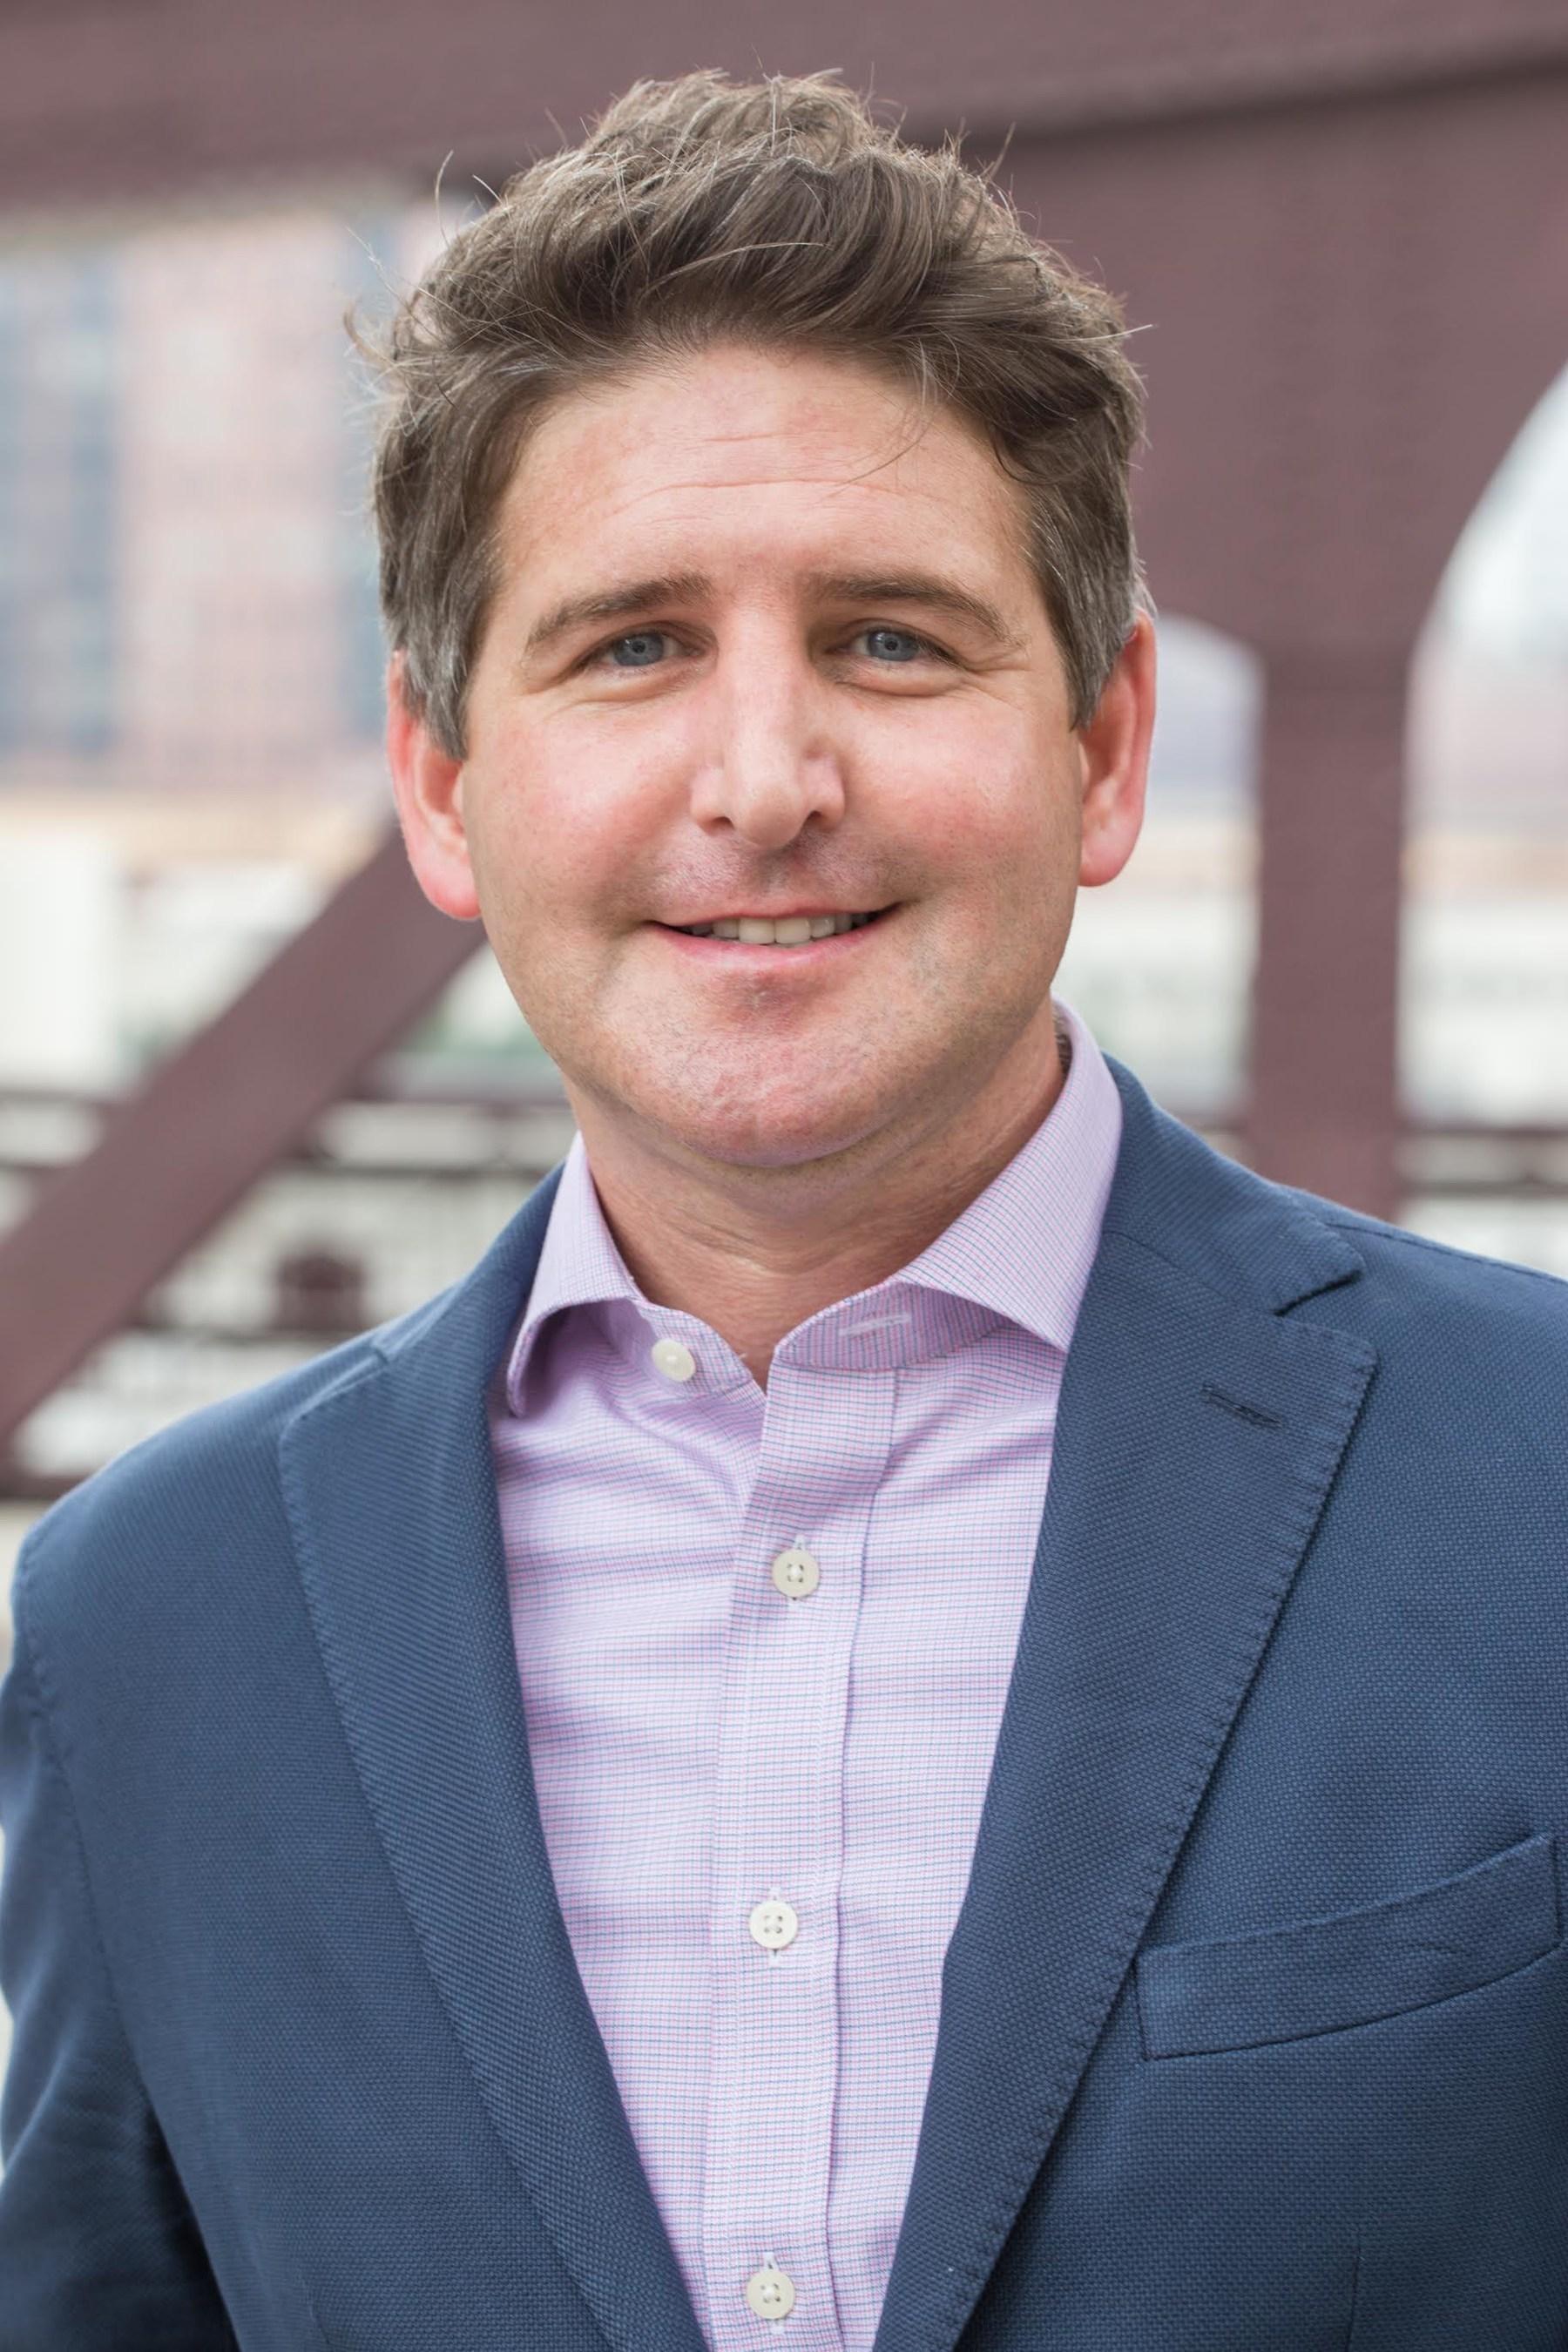 Patrick Flavin, Director of Industry Strategy, ContextMedia:Health